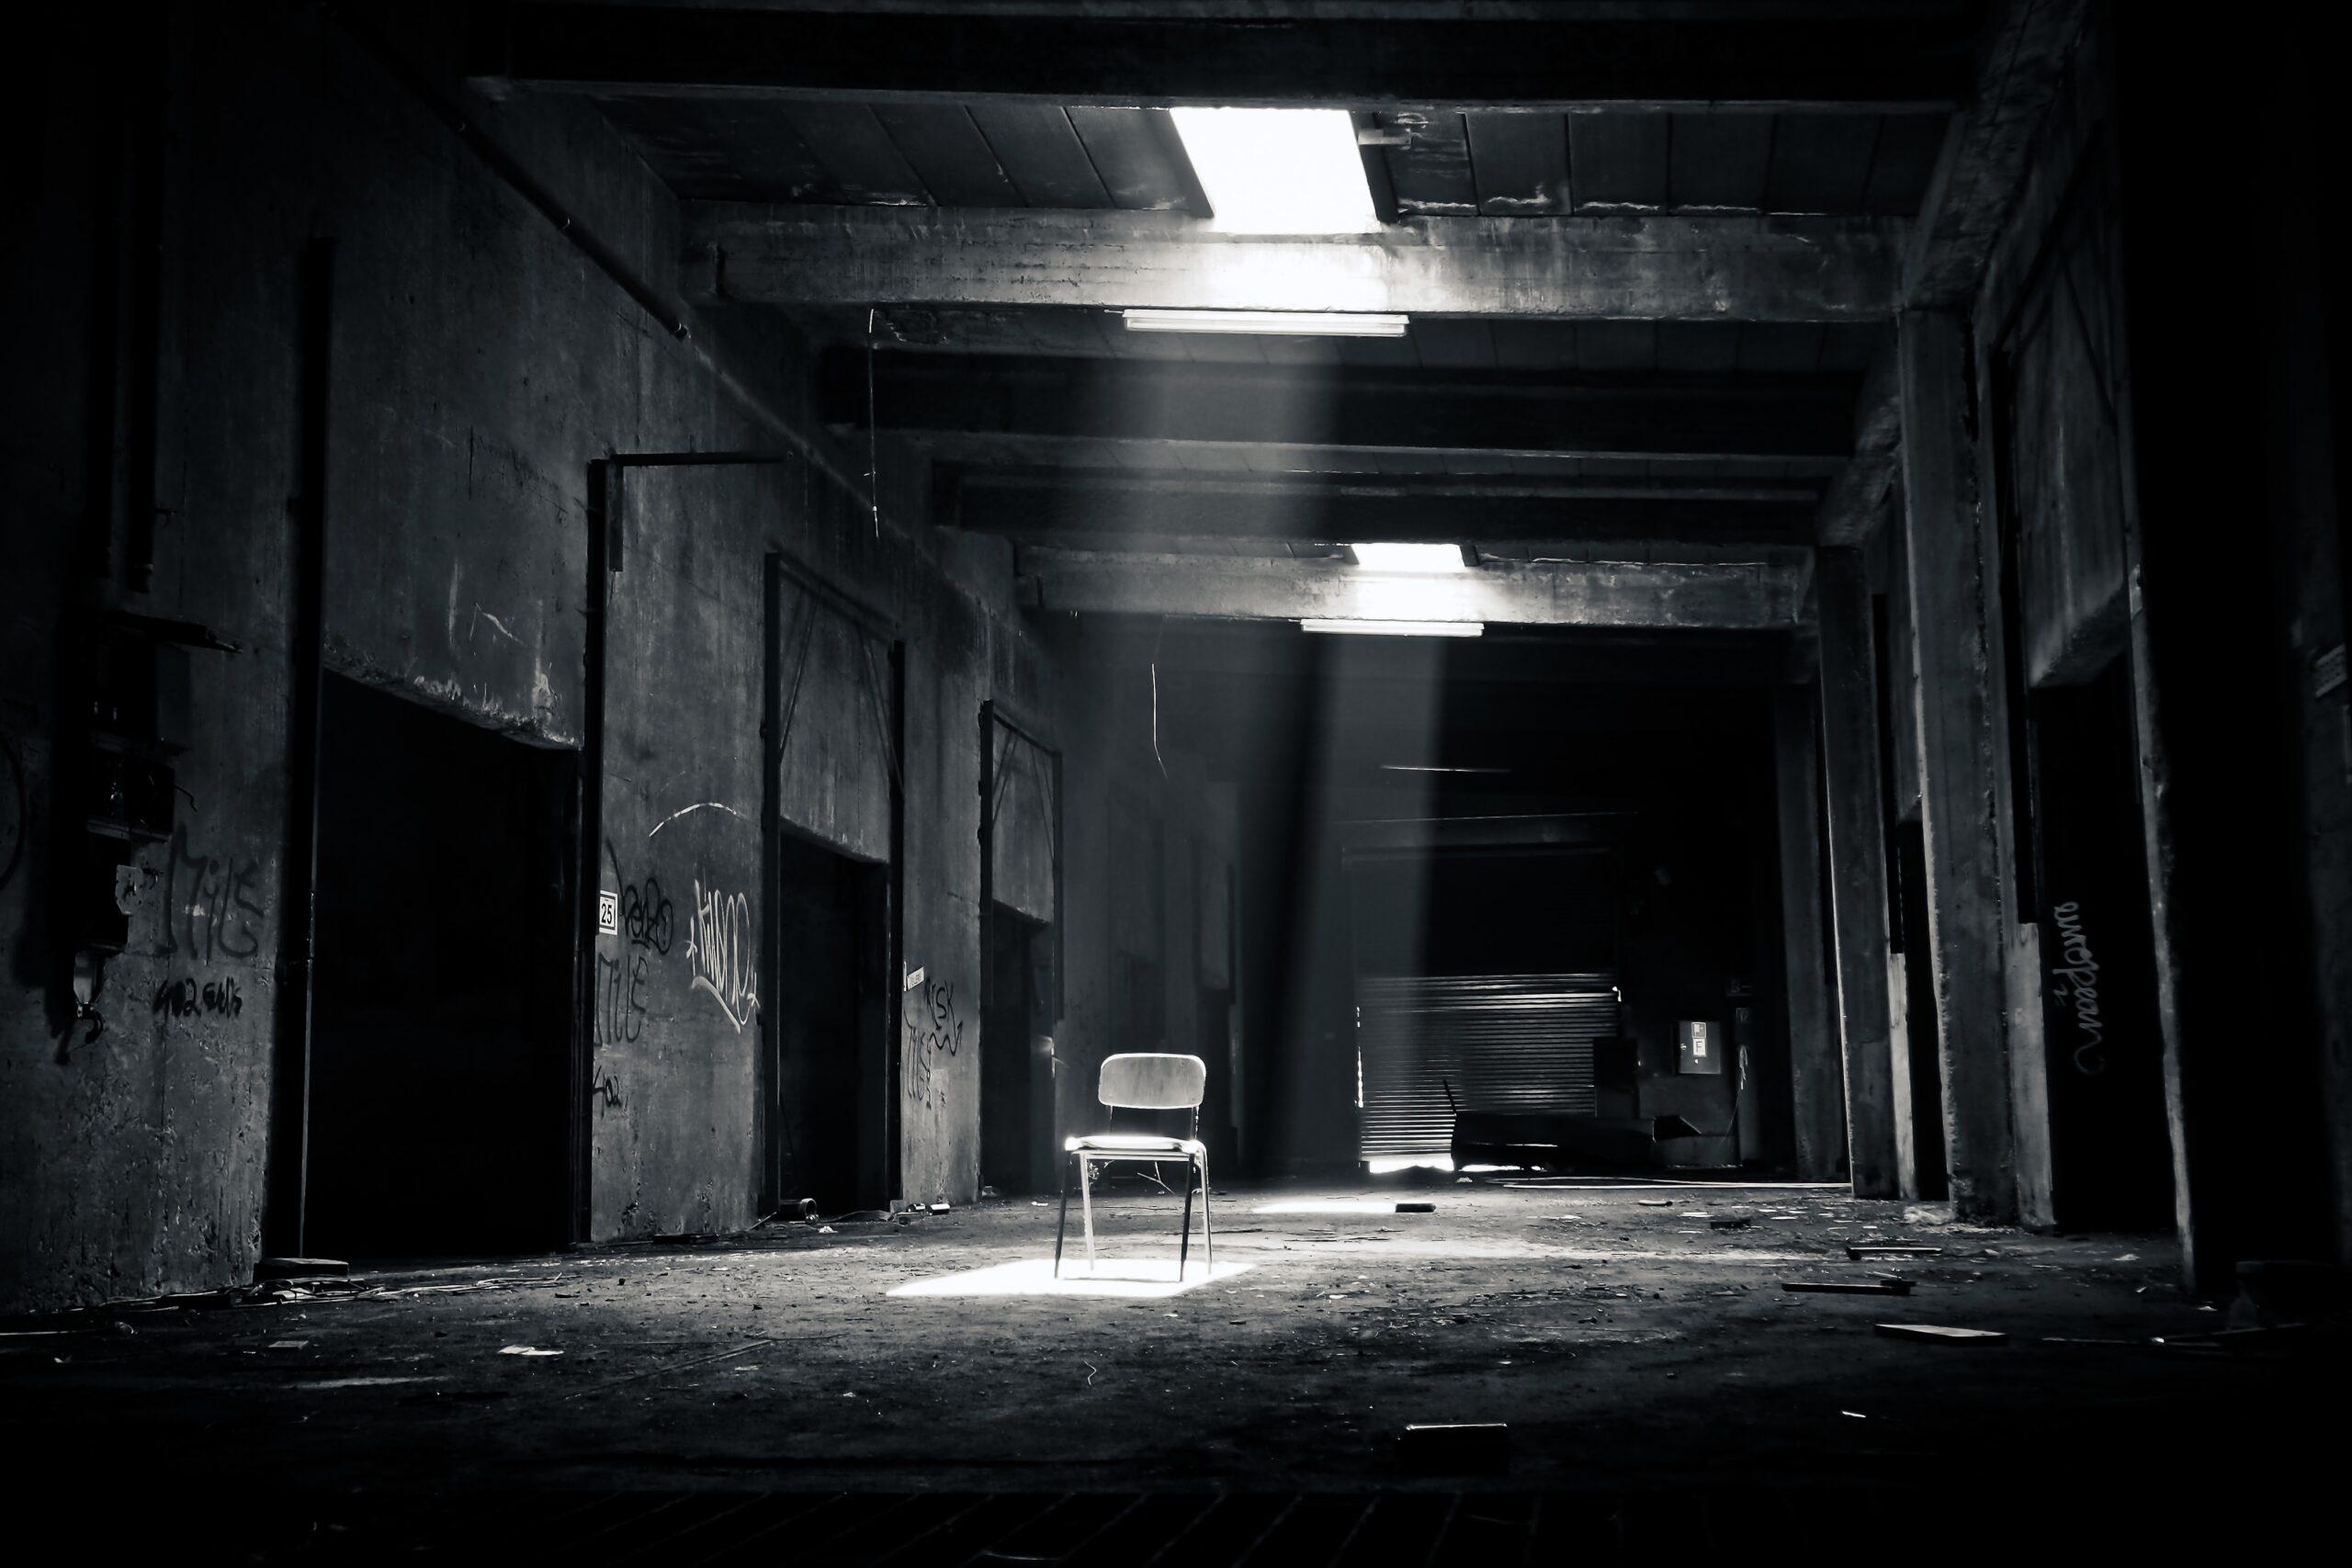 light-black-and-white-architecture-white-night-house-562877-pxhere.com